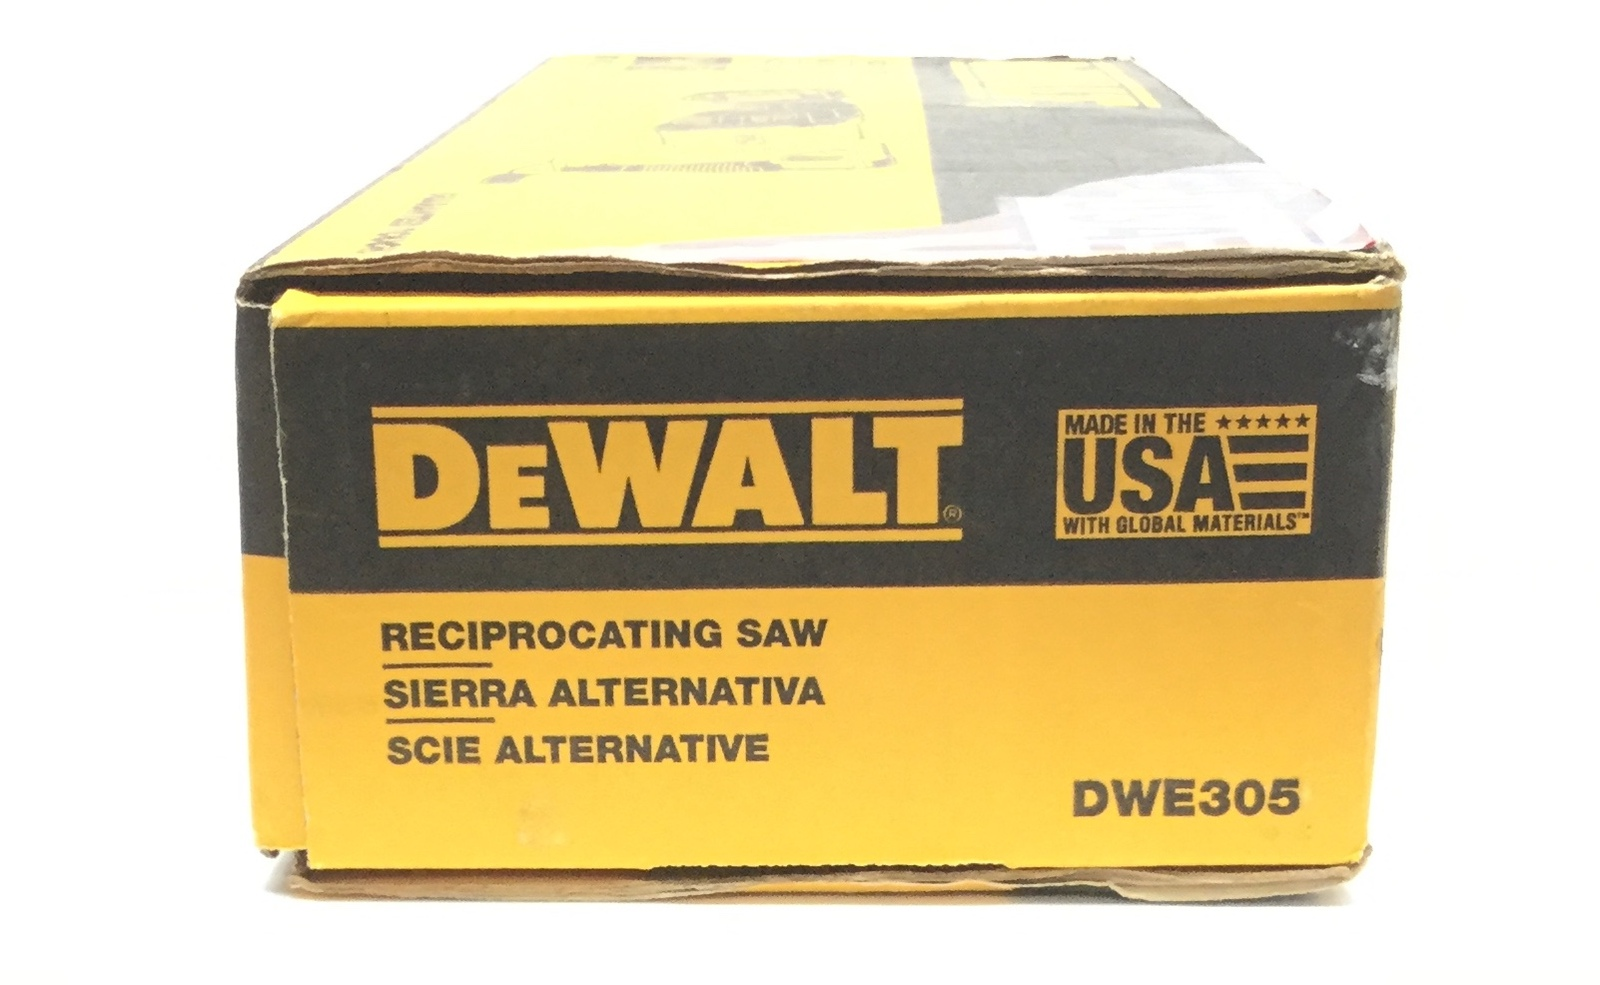 Dewalt Corded Hand Tools Dwe305 image 4